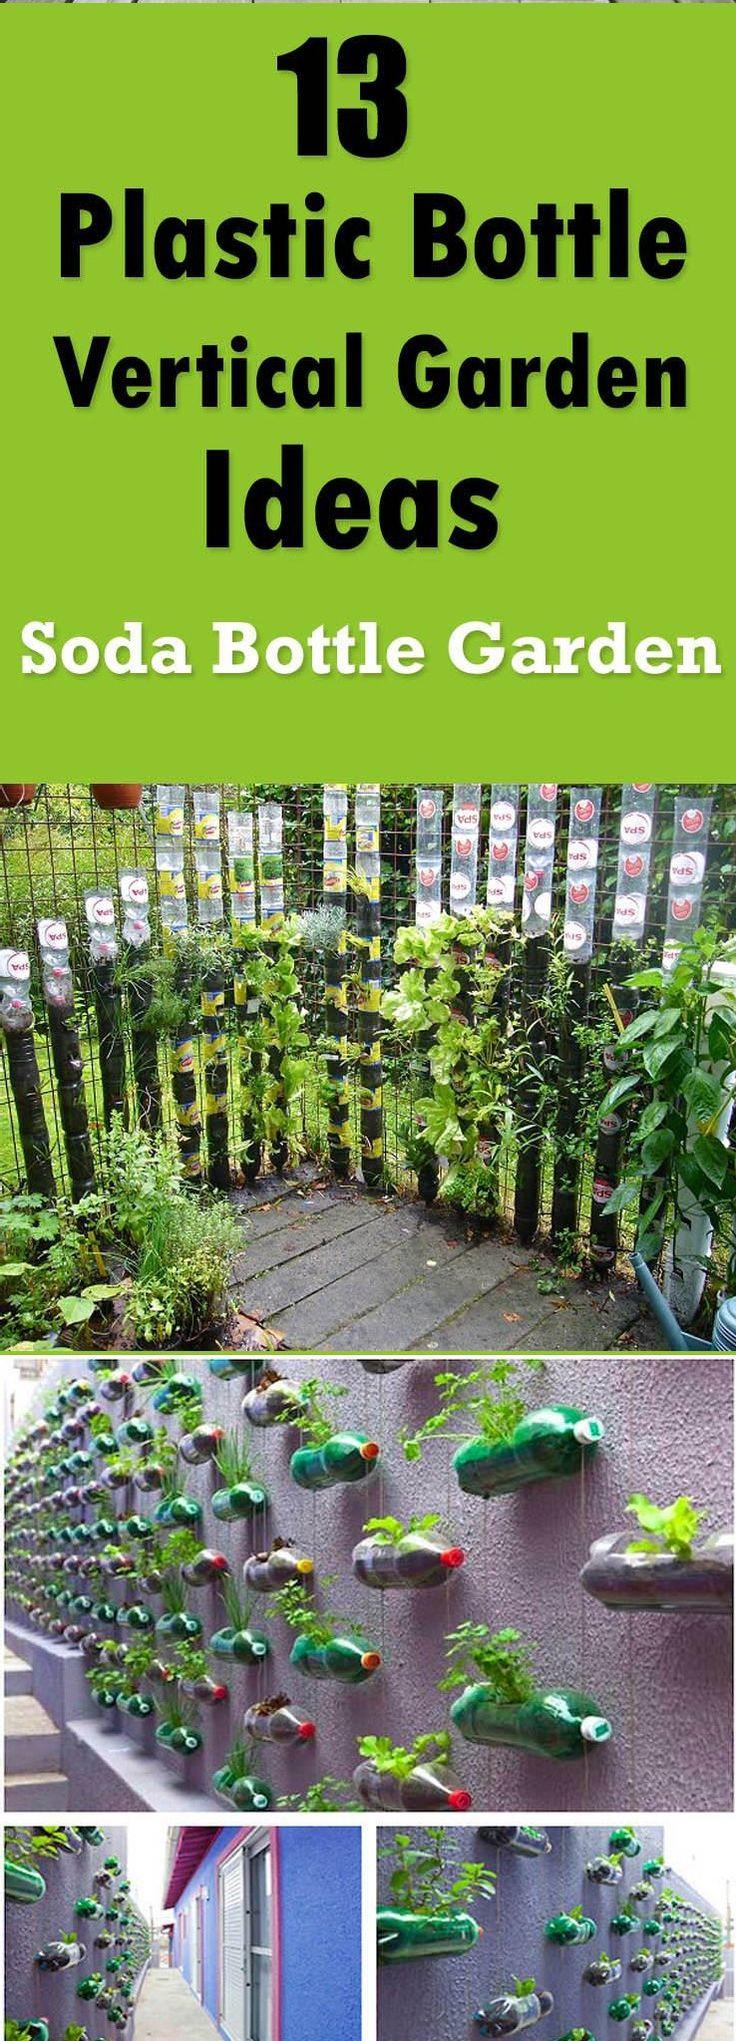 25 best ideas about bottle garden on pinterest - Plastic bottle vertical garden ideas ...